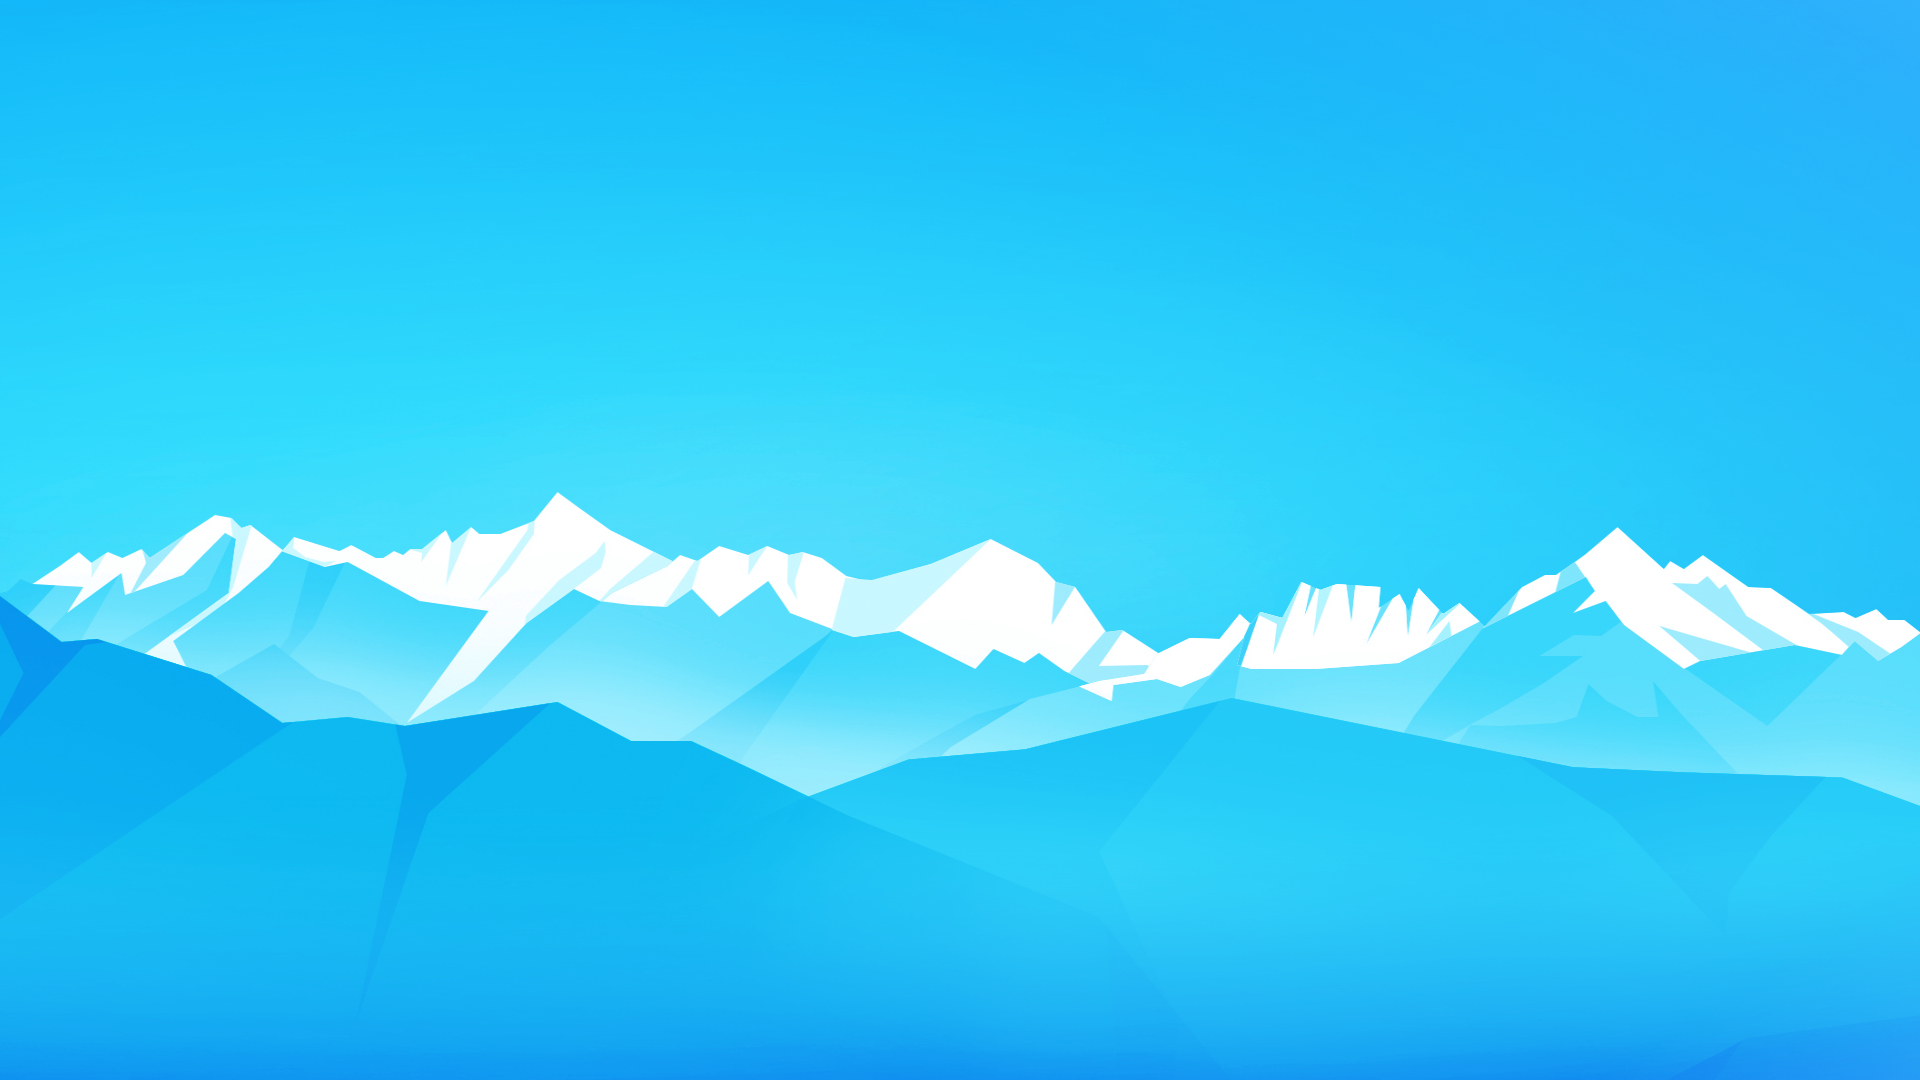 General 1920x1080 mountains sky abstract nature landscape digital art cyan cyan background vector